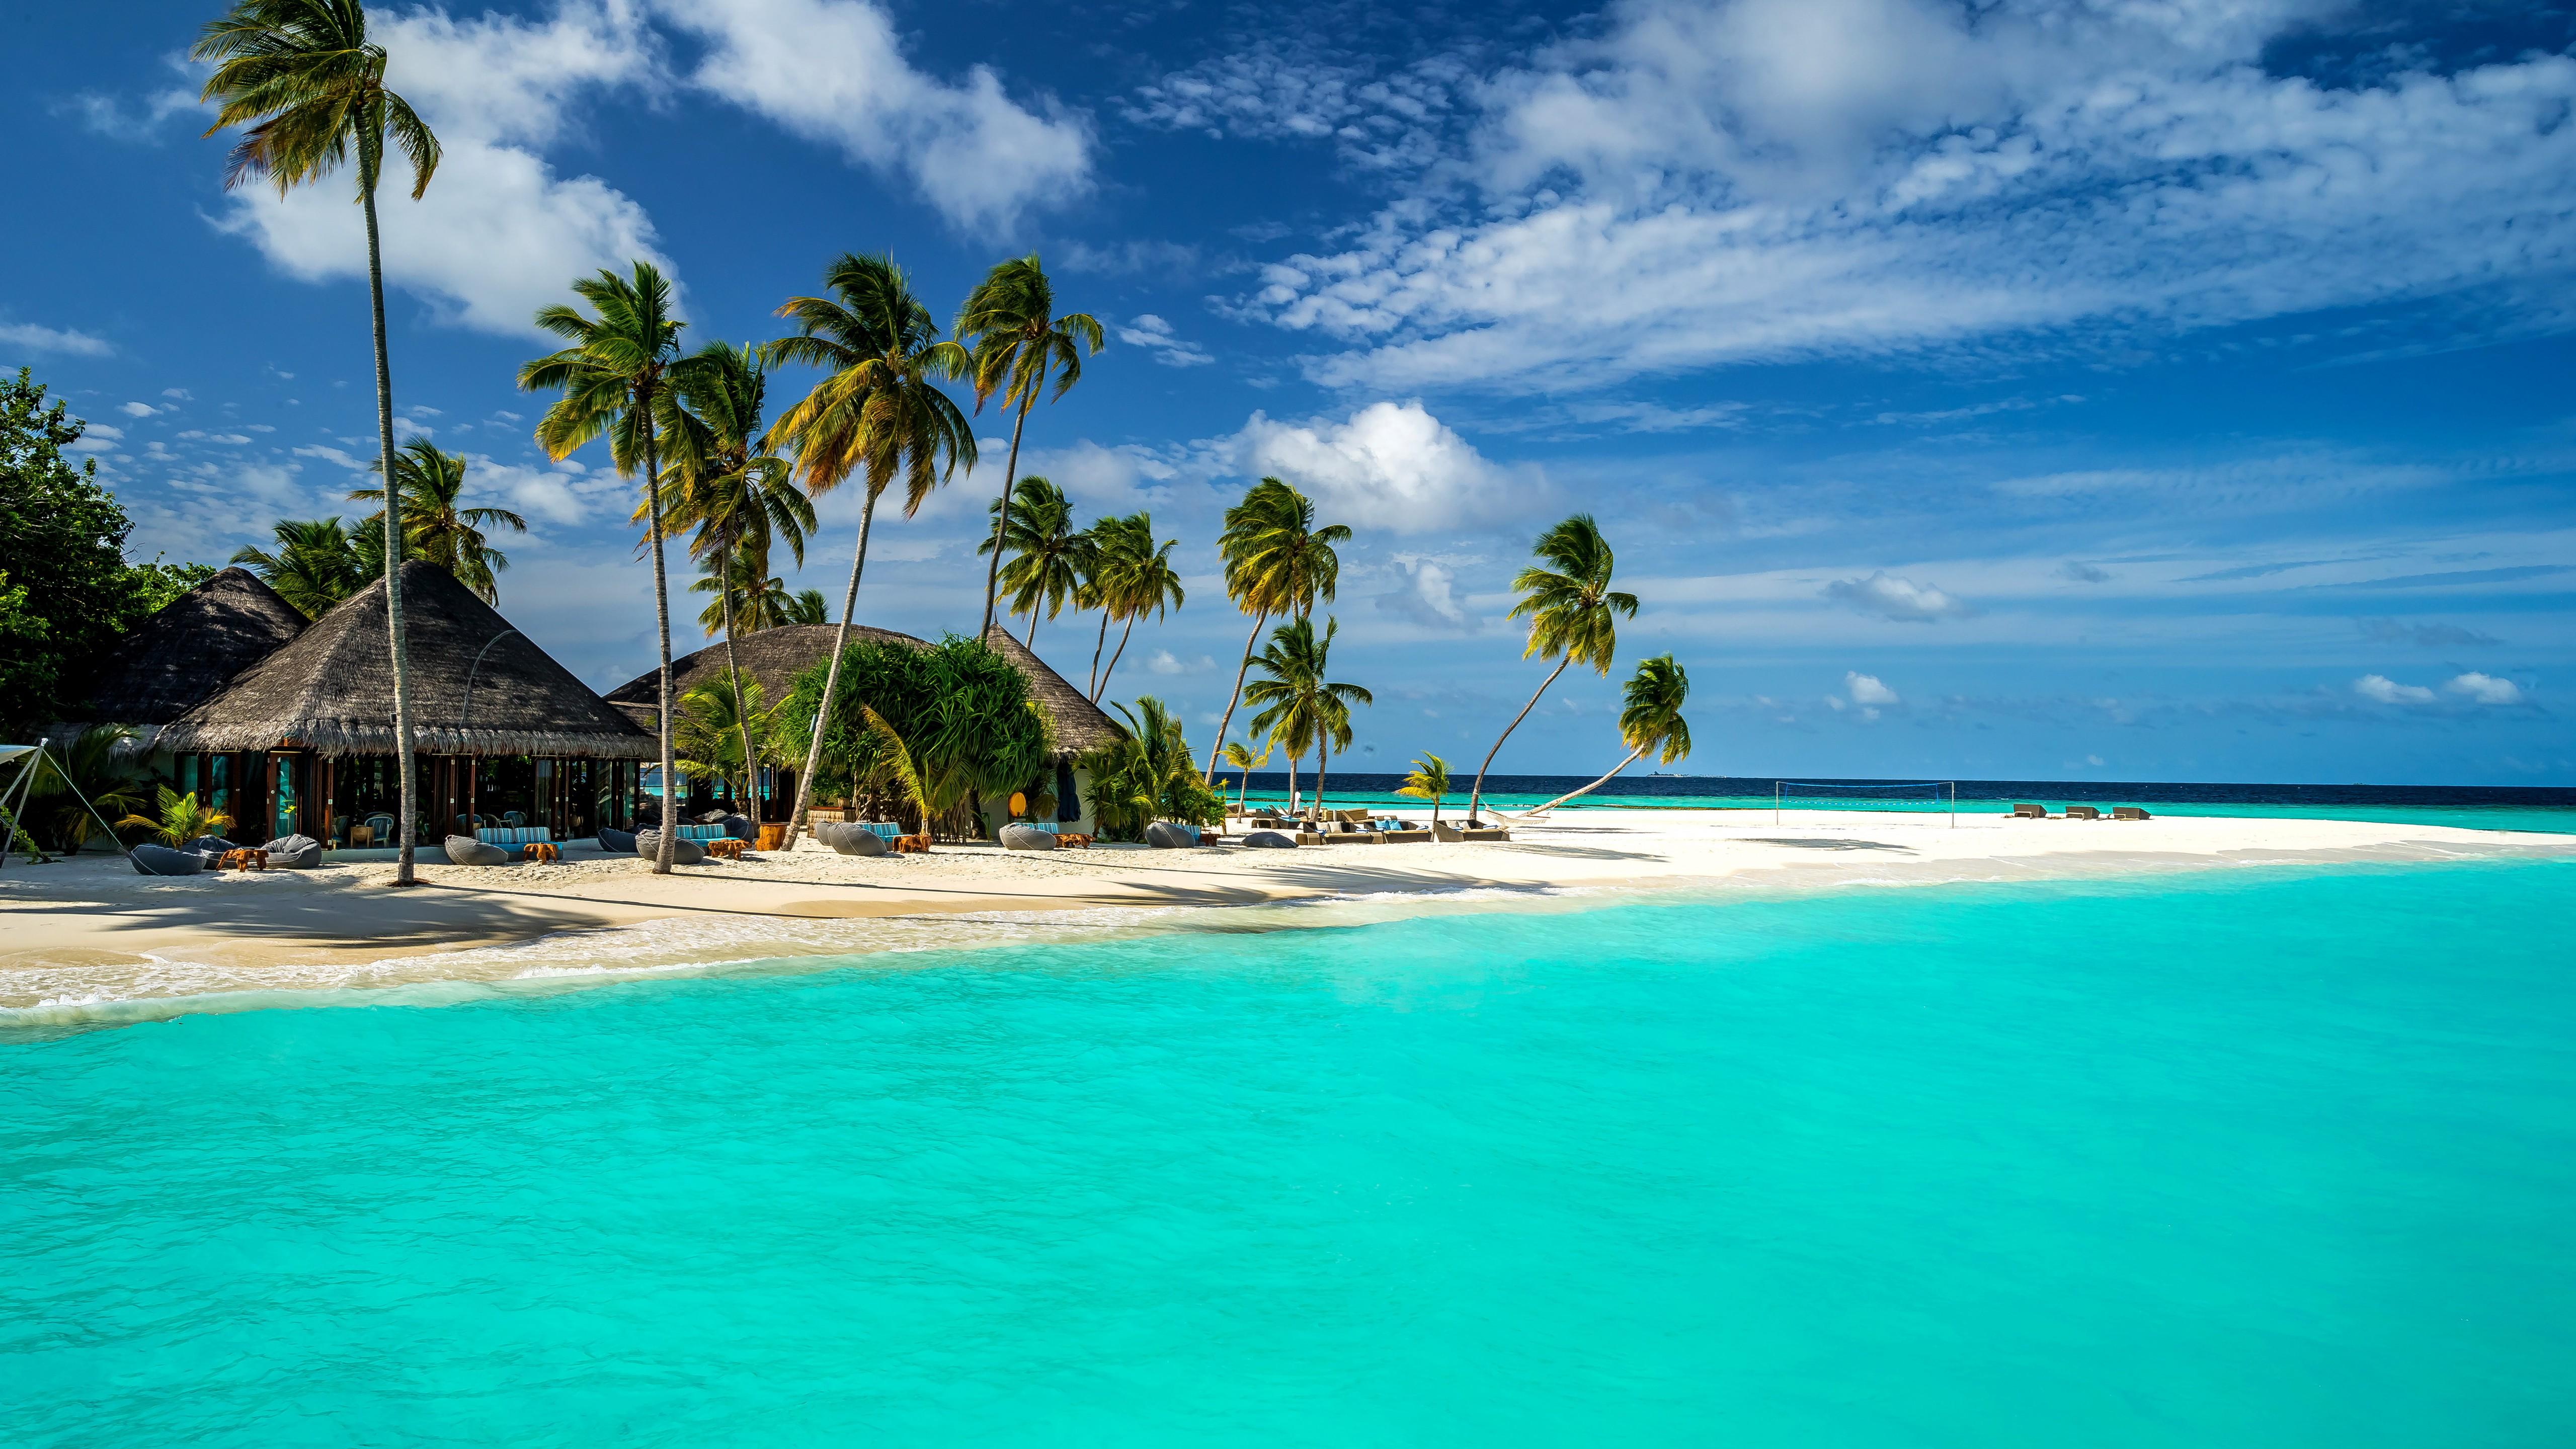 Tropical Paradise Beach 4k Hd Desktop Wallpaper For 4k: Wallpaper Maldives, 5k, 4k Wallpaper, 8k, Indian Ocean